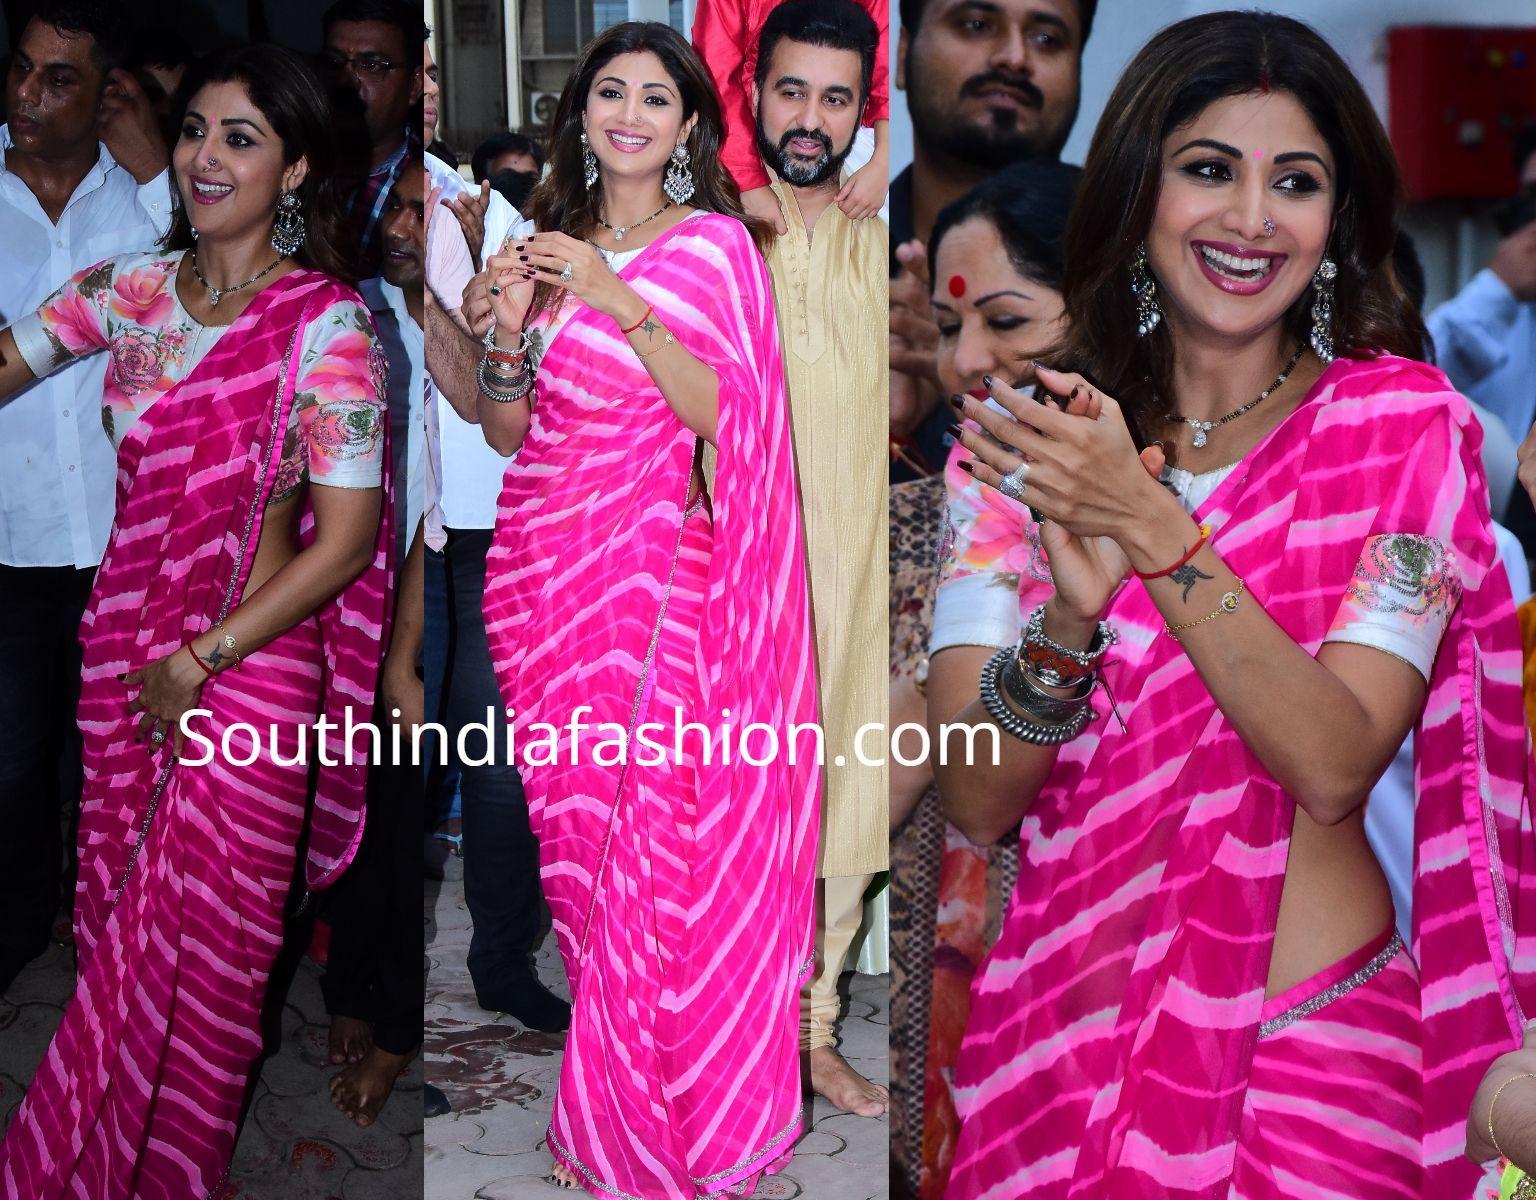 Shilpa Shetty in a leheriya saree at Ganesh Visarjan – South India Fashion -   - #EmmaRoberts #Fashion #FashionDesigners #Ganesh #India #leheriya #Saree #Shetty #Shilpa #ShilpaShetty #South #VictoriaBeckham #Visarjan